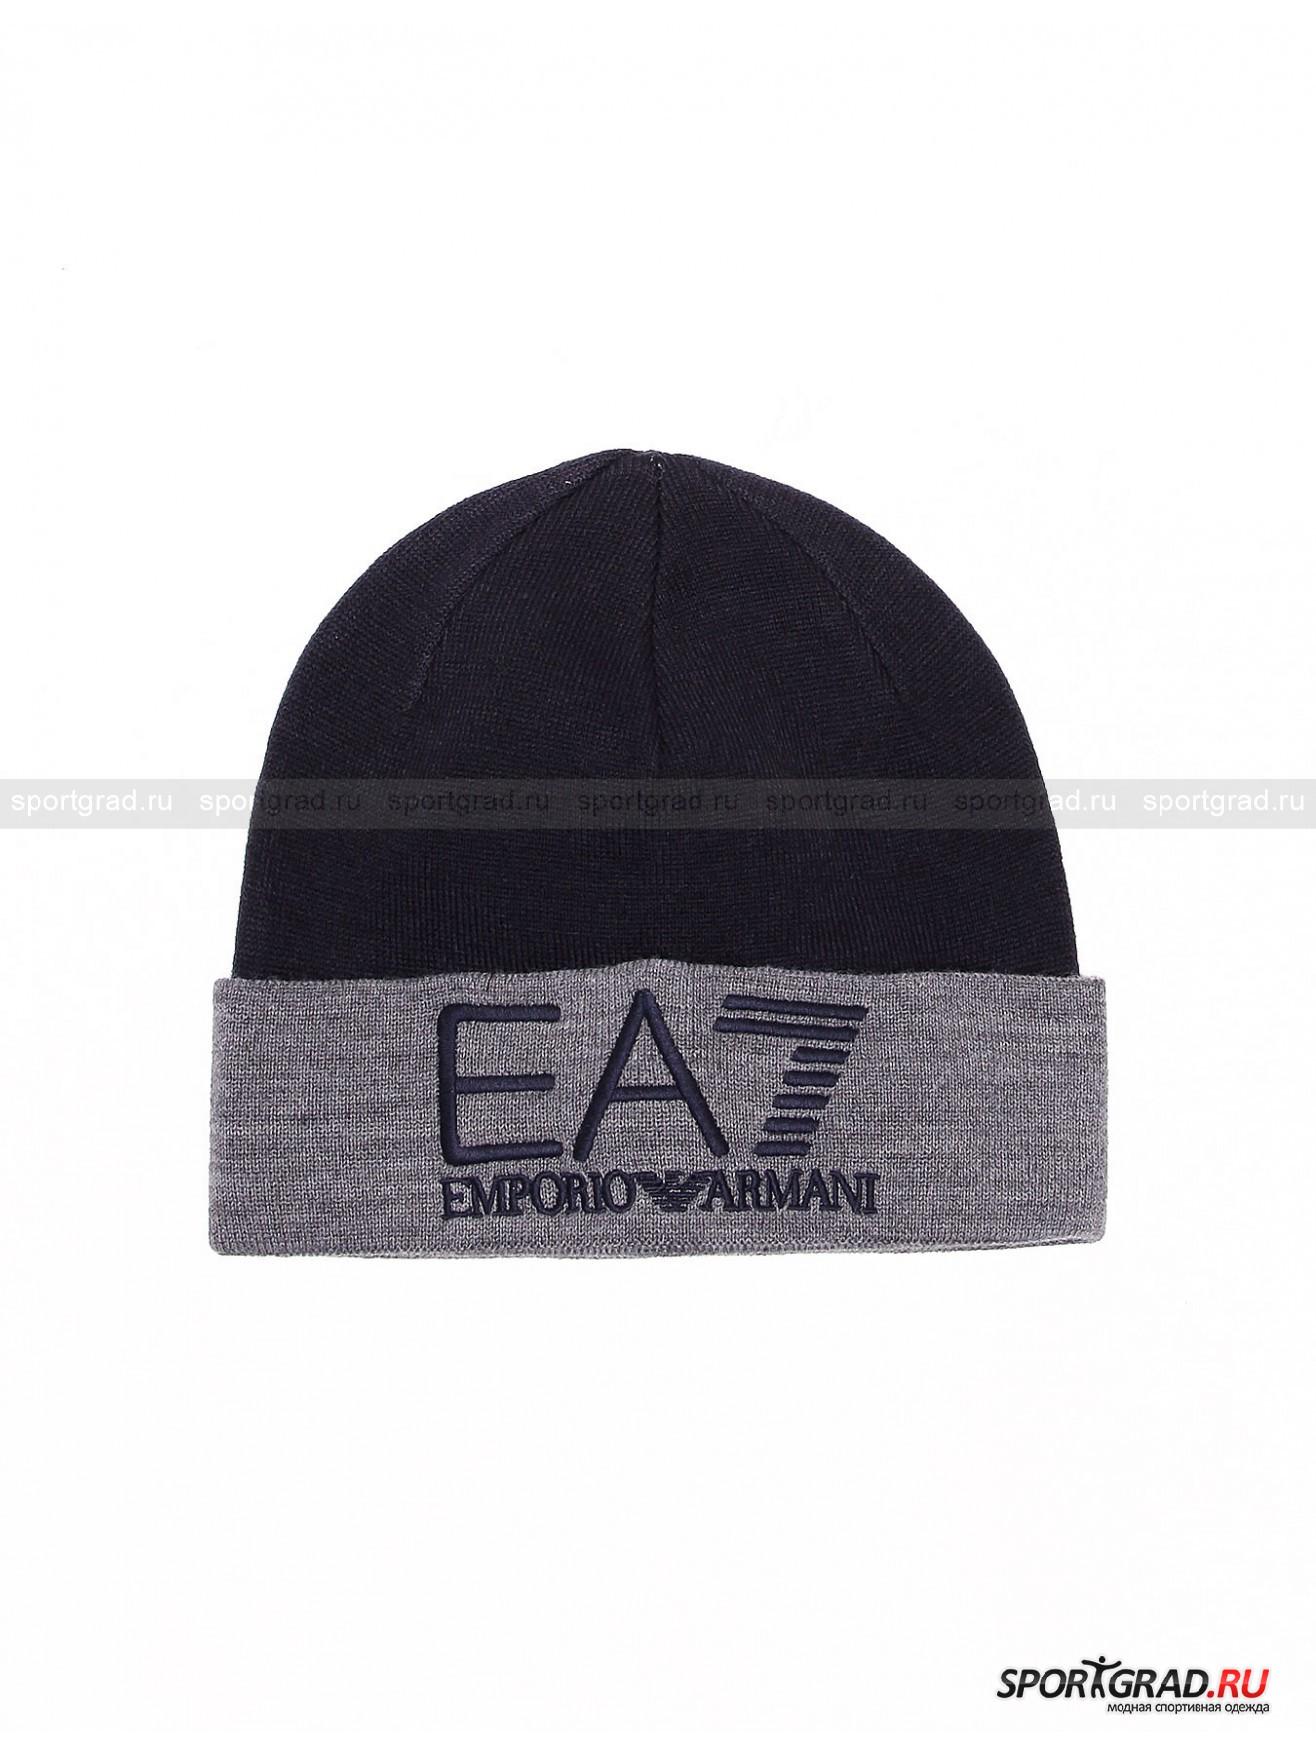 Шапка мужская Urban Mountain Hat EMPORIO ARMANI